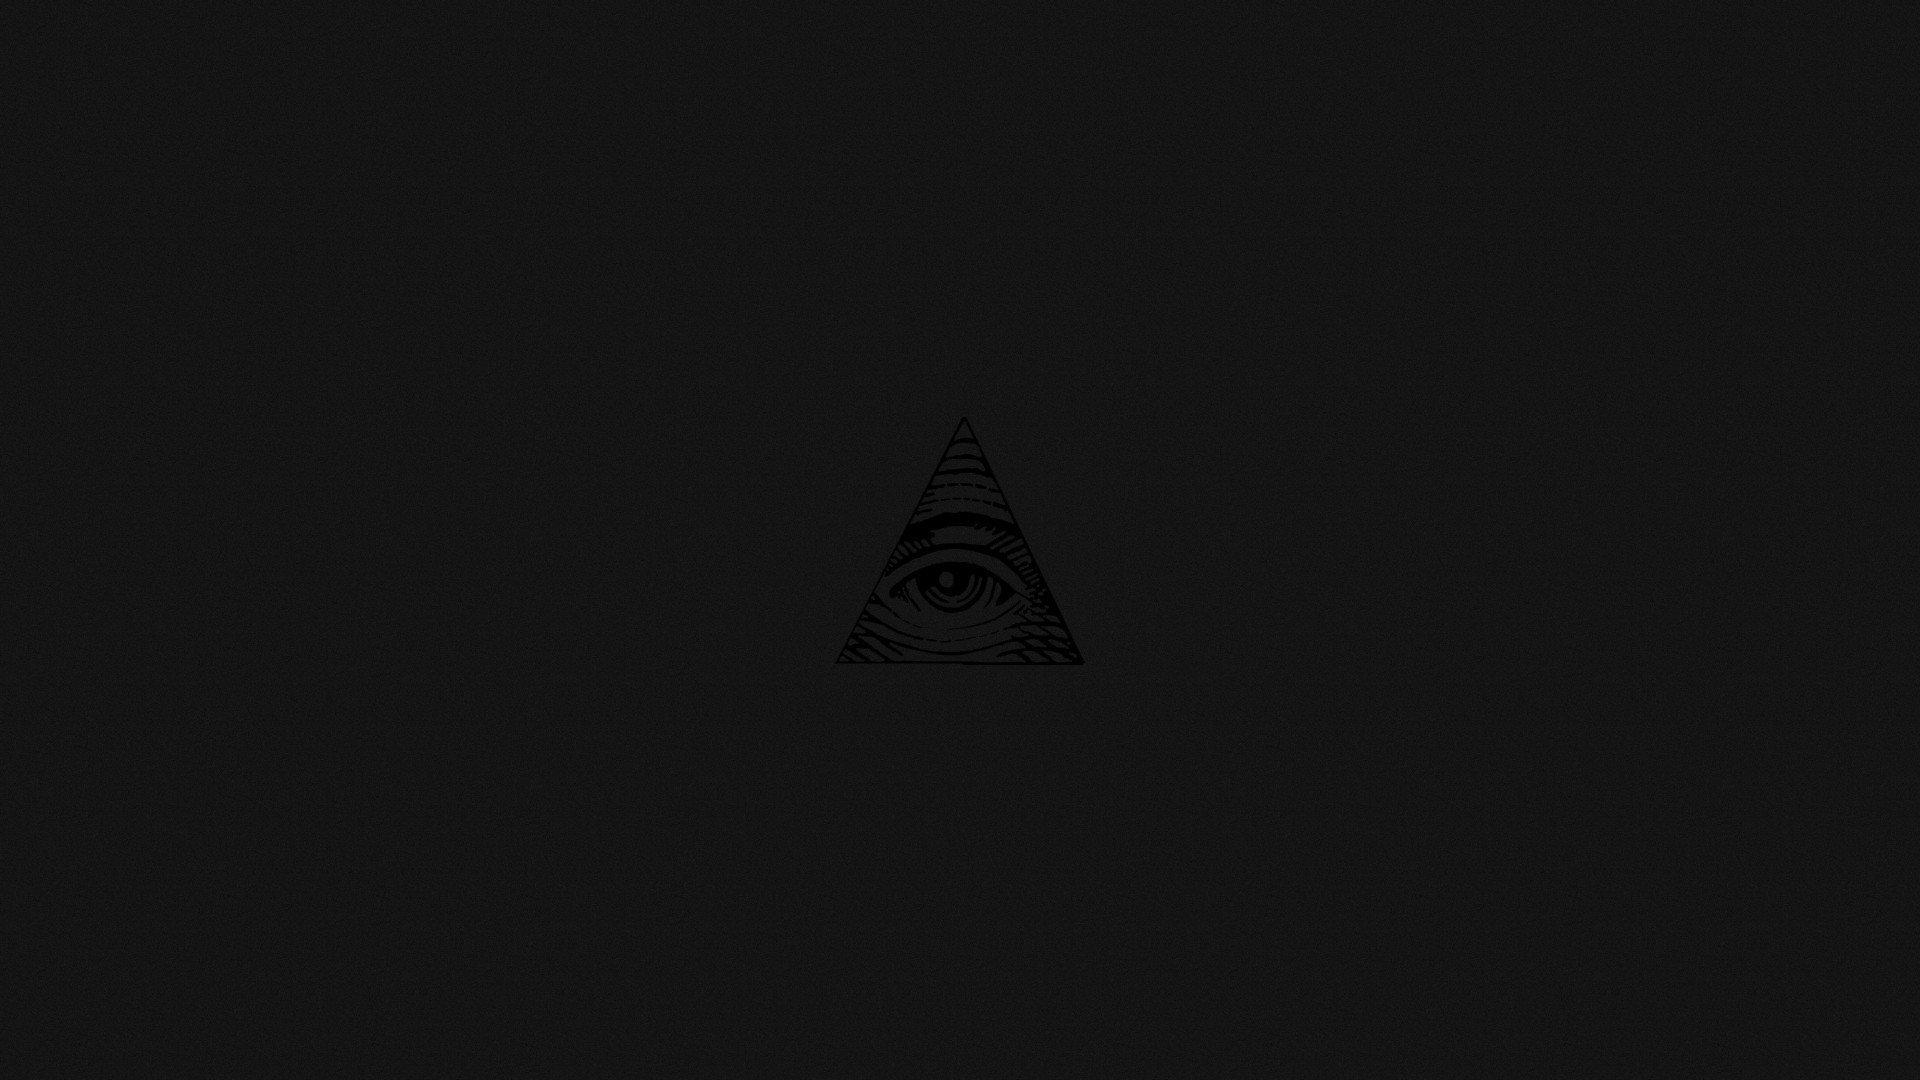 53] Masonic Wallpaper on WallpaperSafari 1920x1080